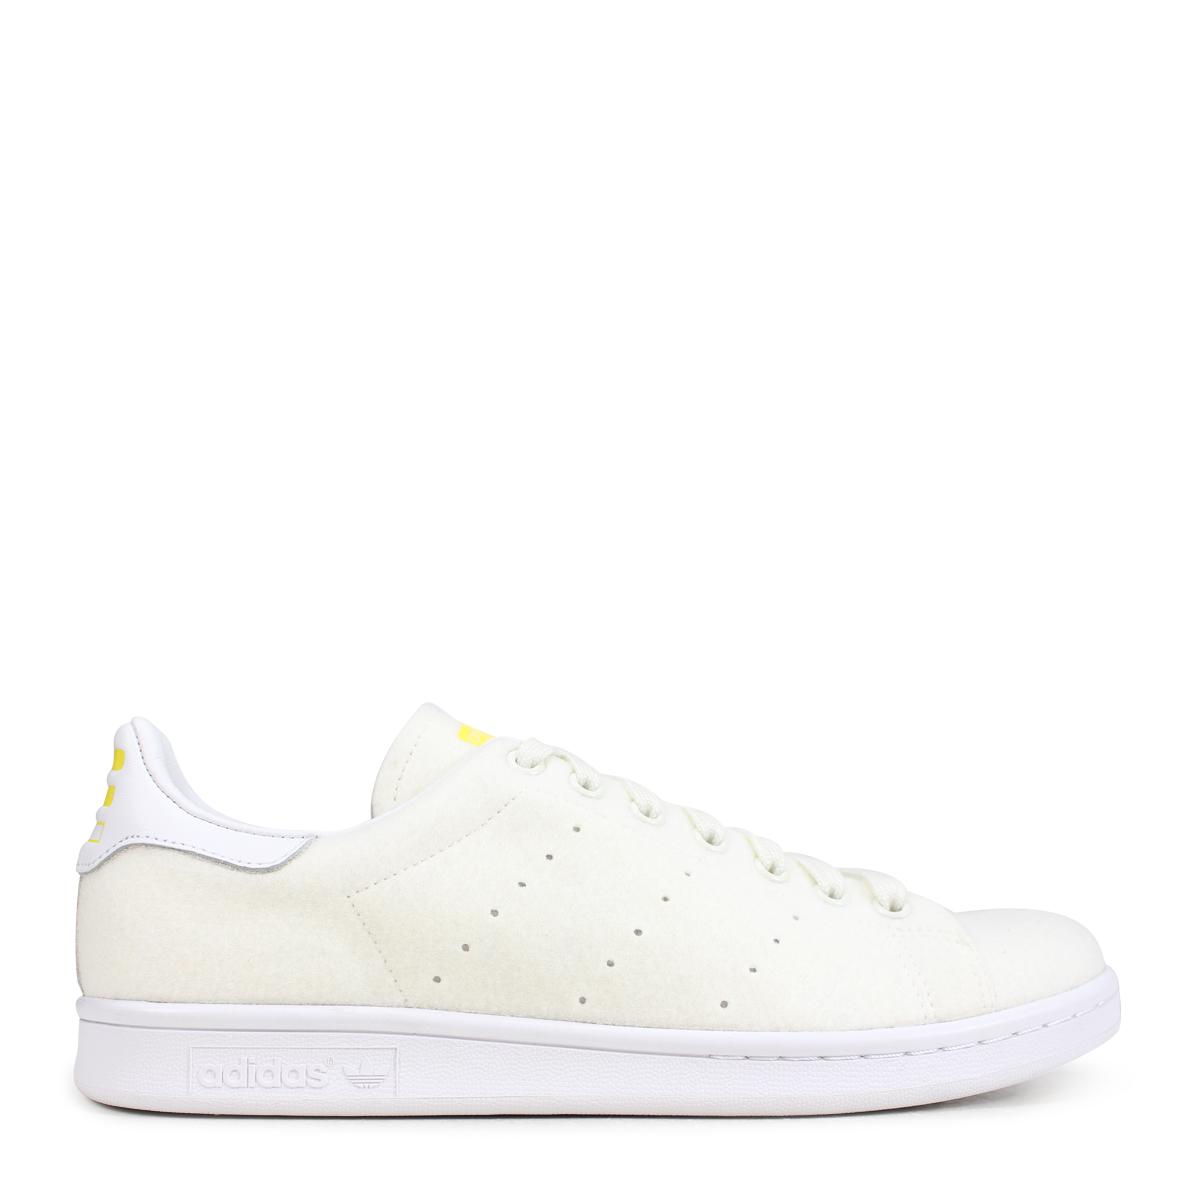 adidas Originals PHARRELL WILLIAMS STAN SMITH TENNIS PACK Adidas originals Stan Smith men sneakers B25390 white [load planned Shinnyu load in